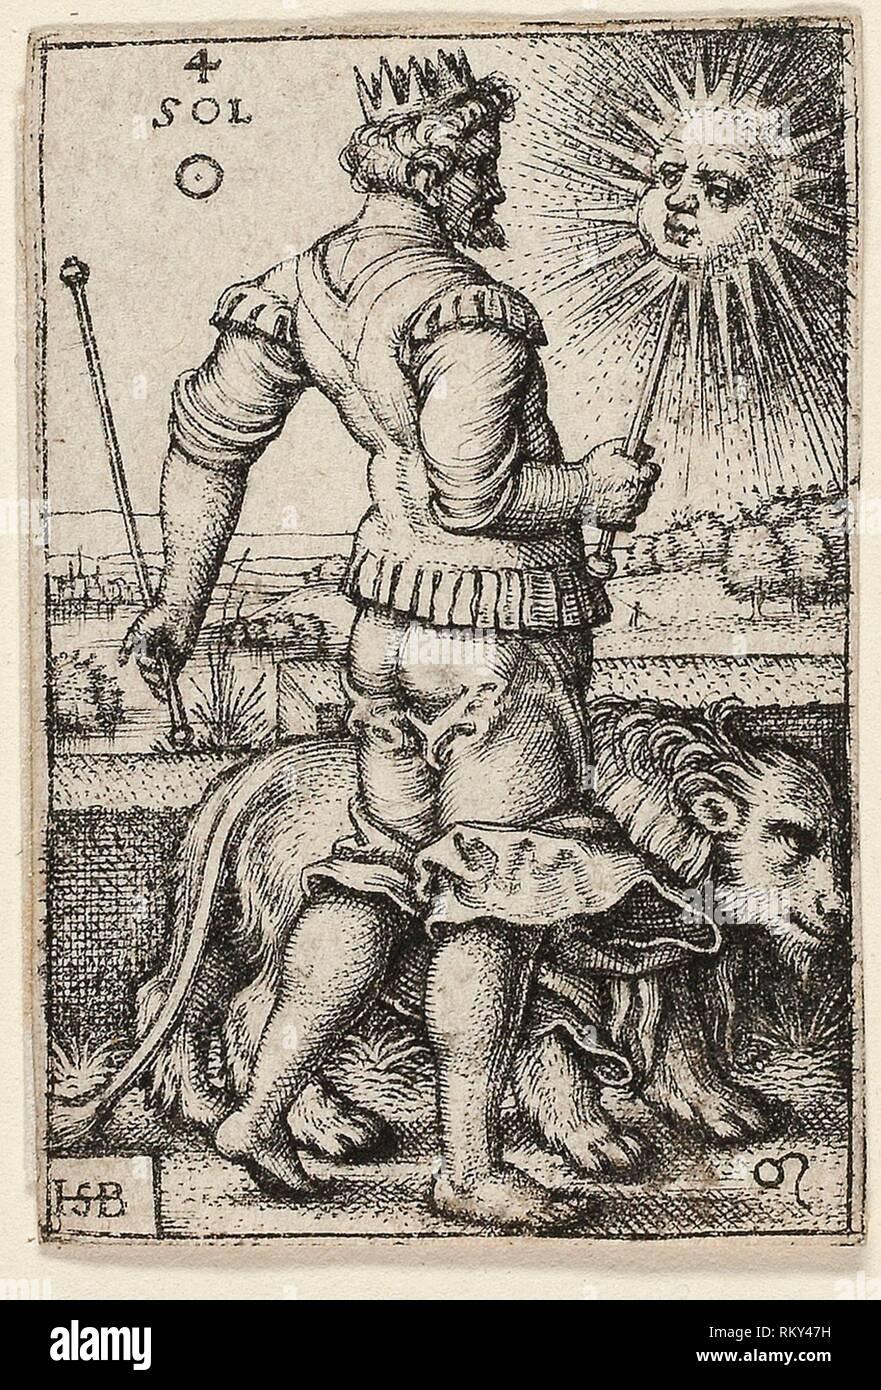 Sun, plate four from The Seven Planets with the Zodiacs - 1539 - Sebald Beham German, 1500-1550 - Artist: Hans Sebald Beham, Origin: Germany, Date: - Stock Image